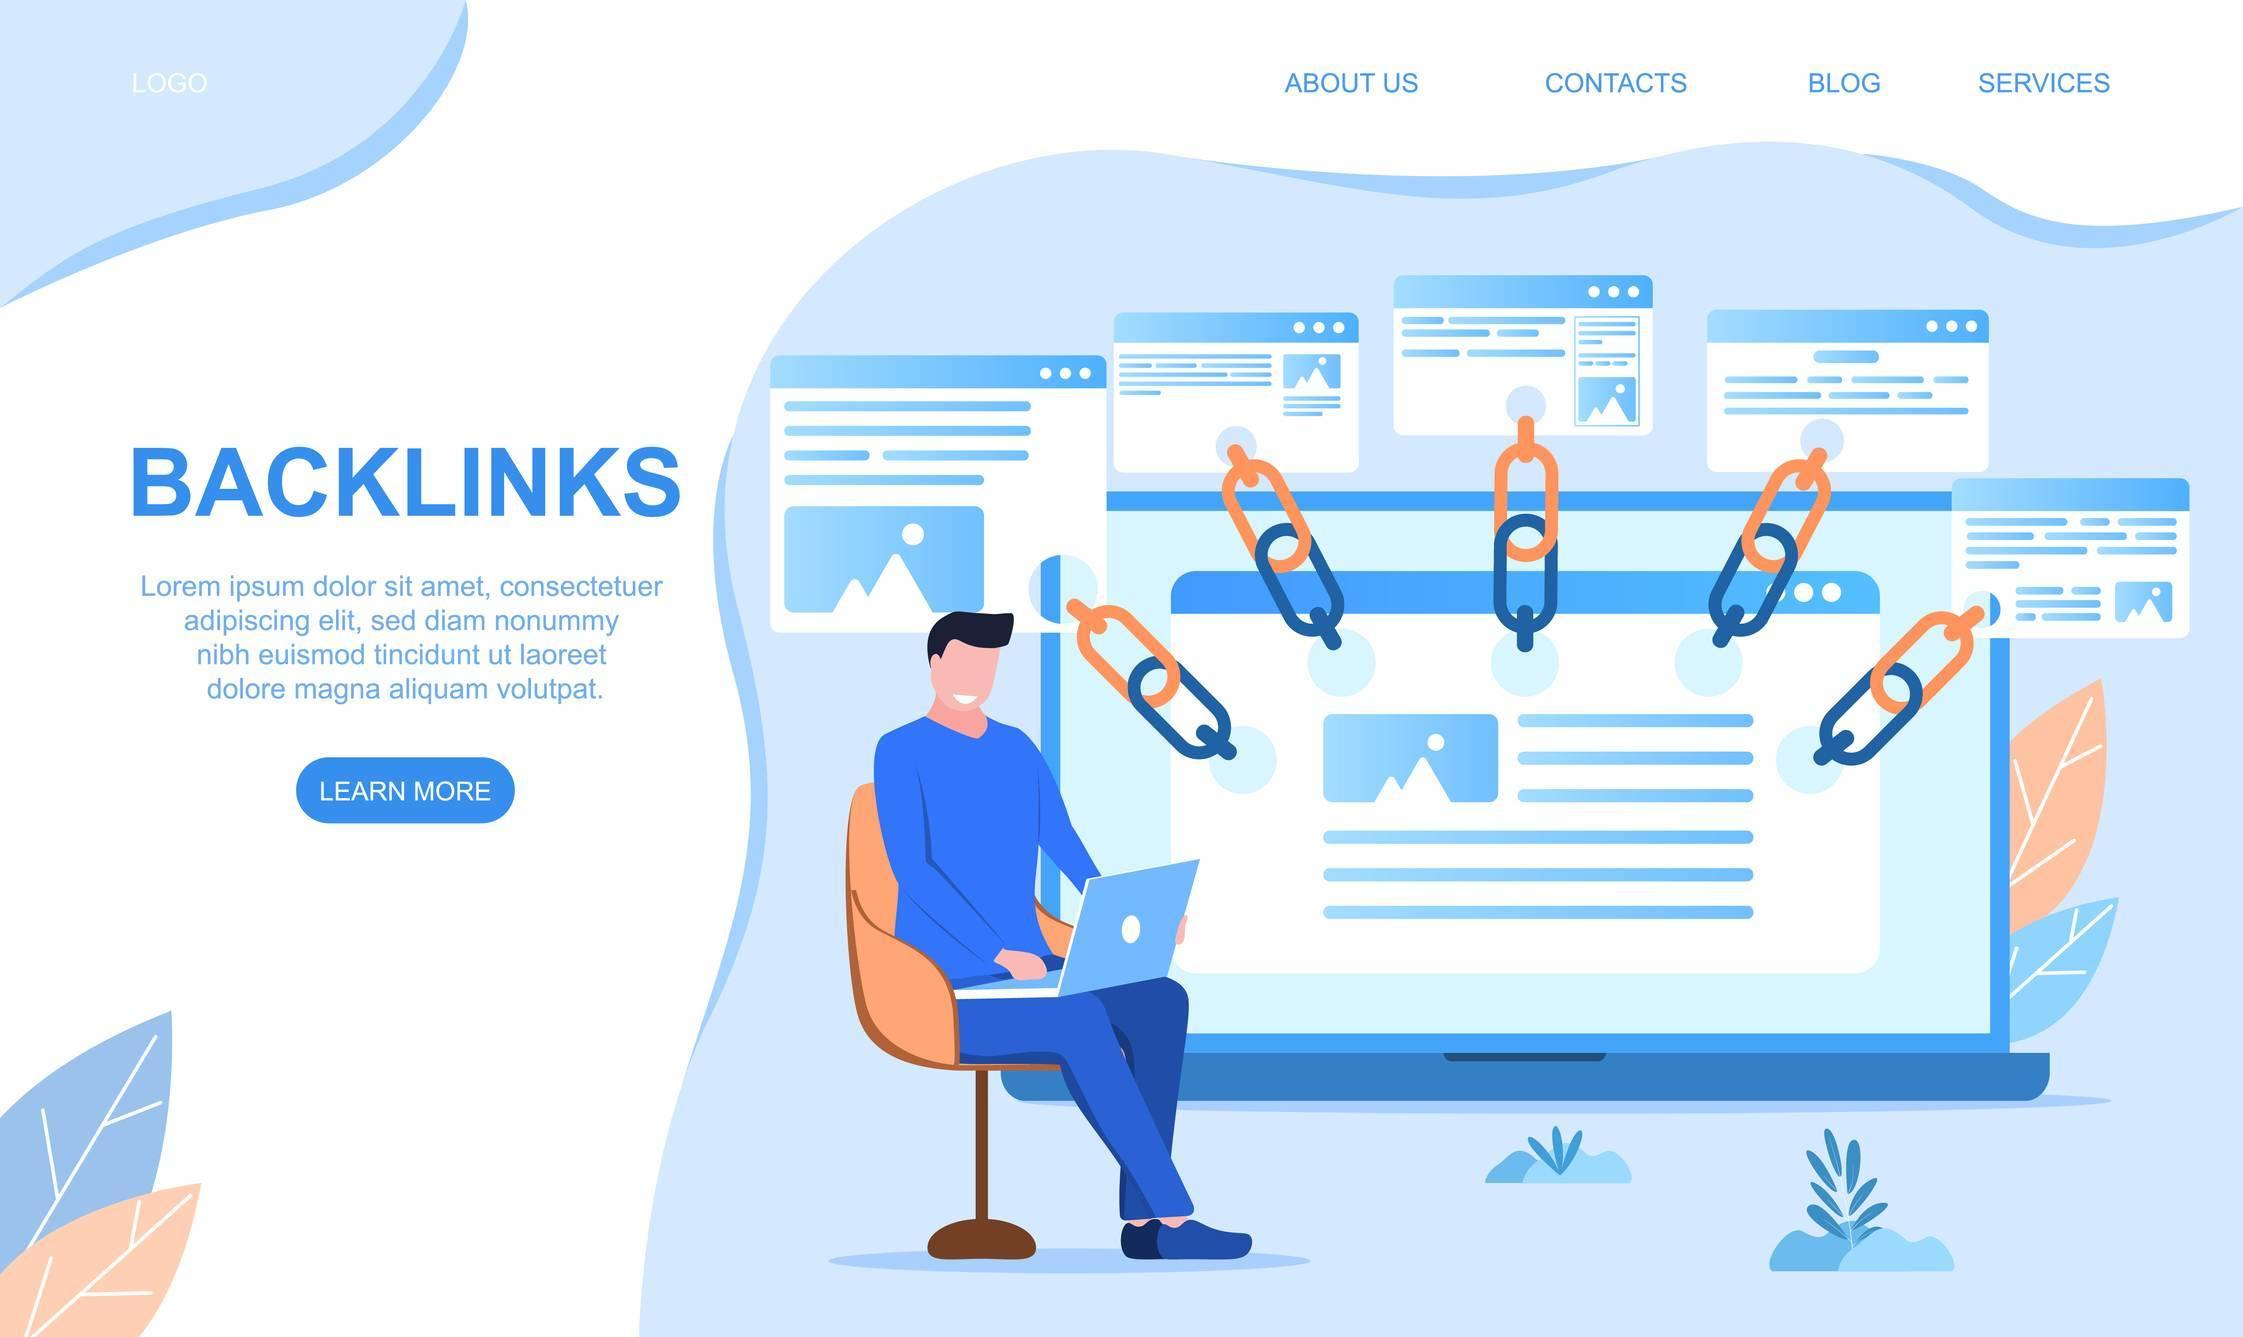 Les backlinks, piliers du netlinking